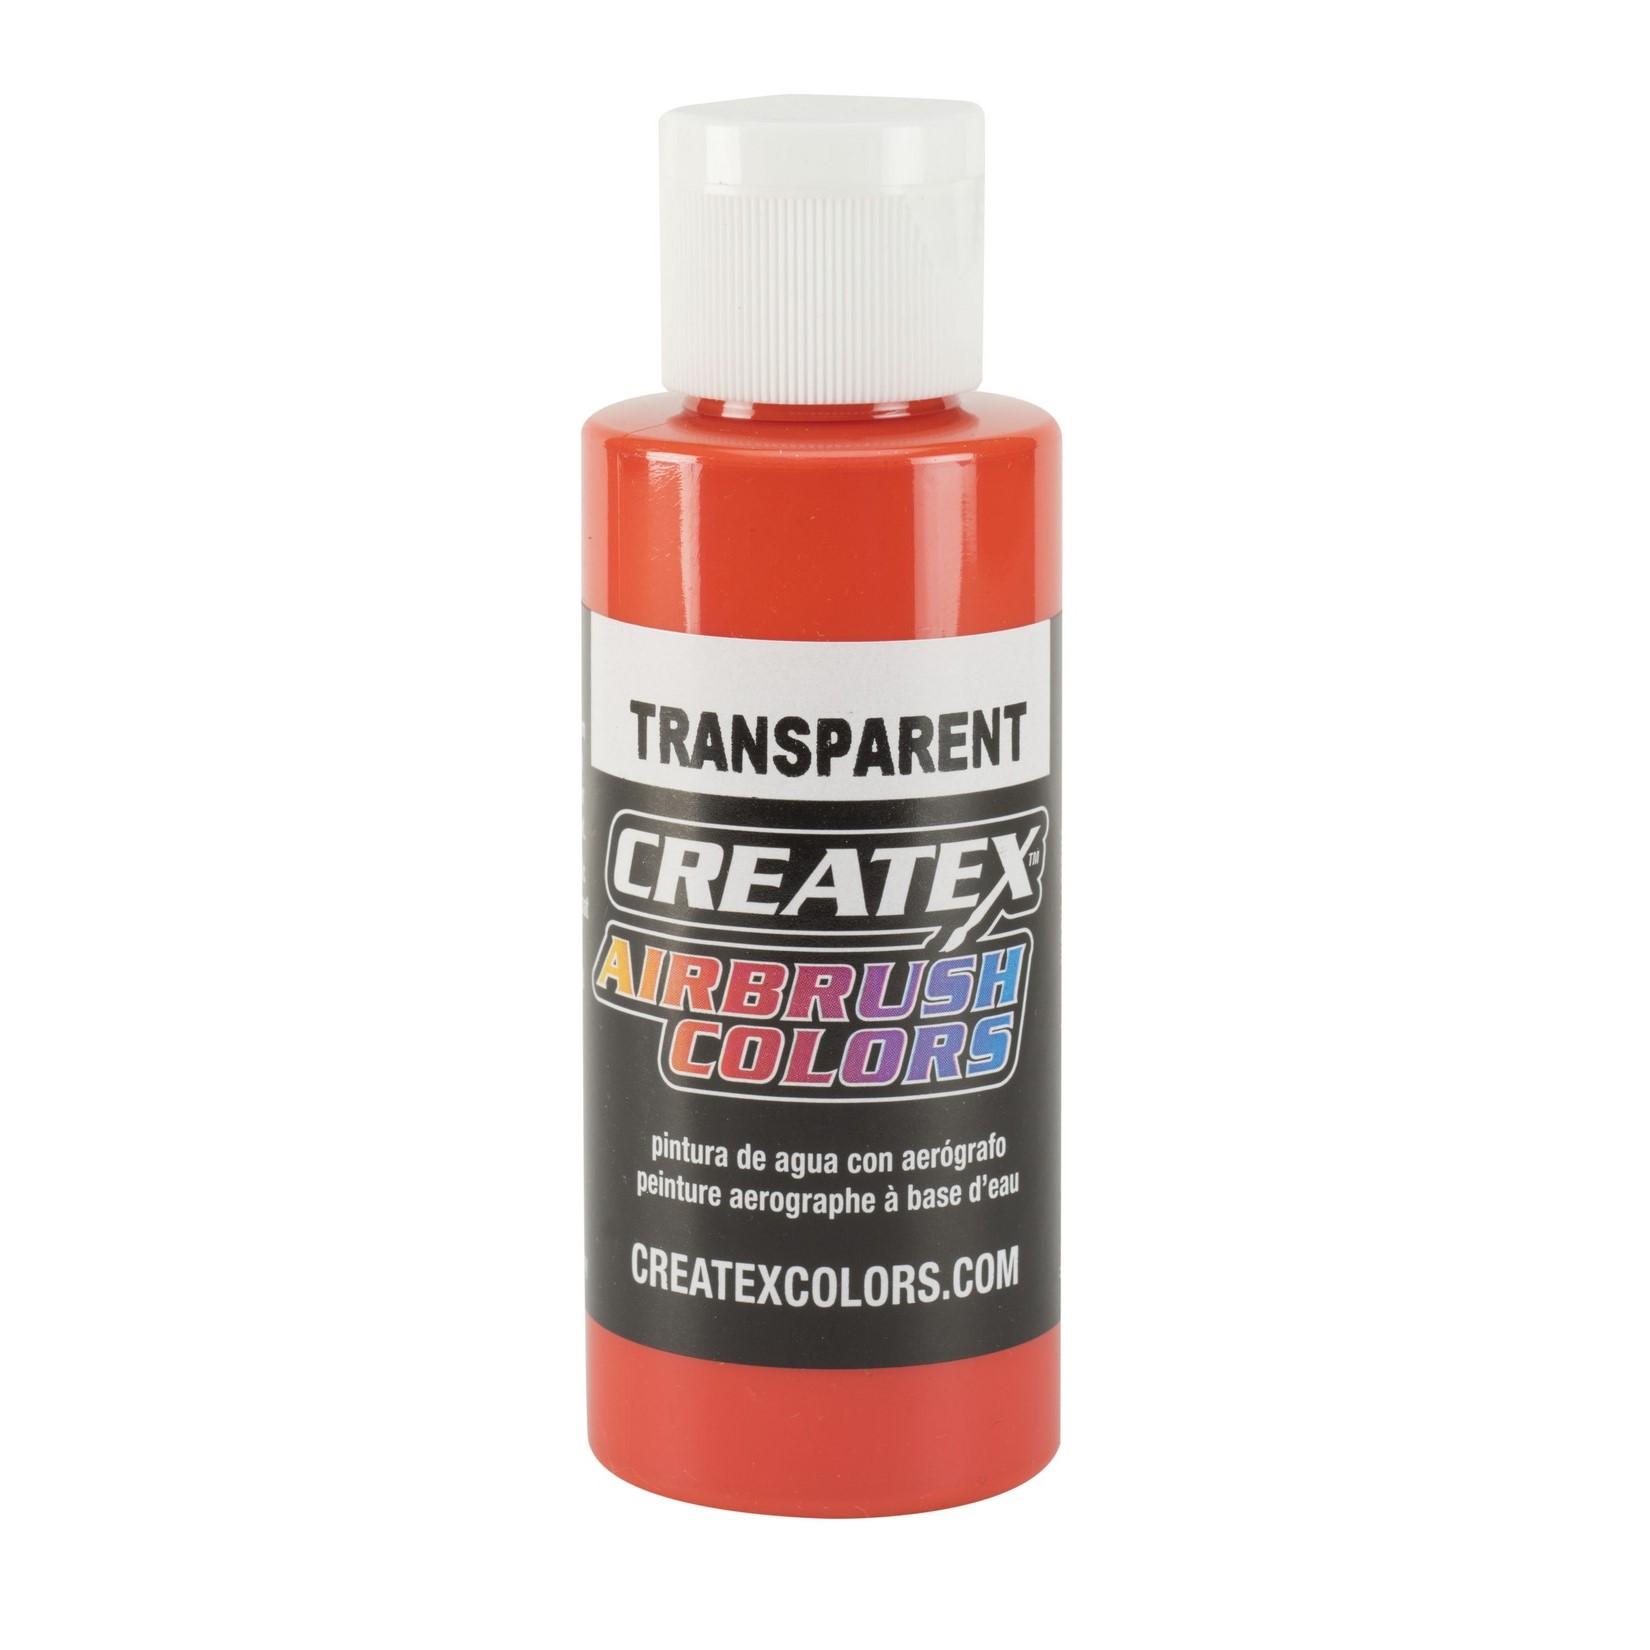 Sunset Red (Scharlach) Createx Airbrush Colors Farbe 240ml 13 5118 Createx